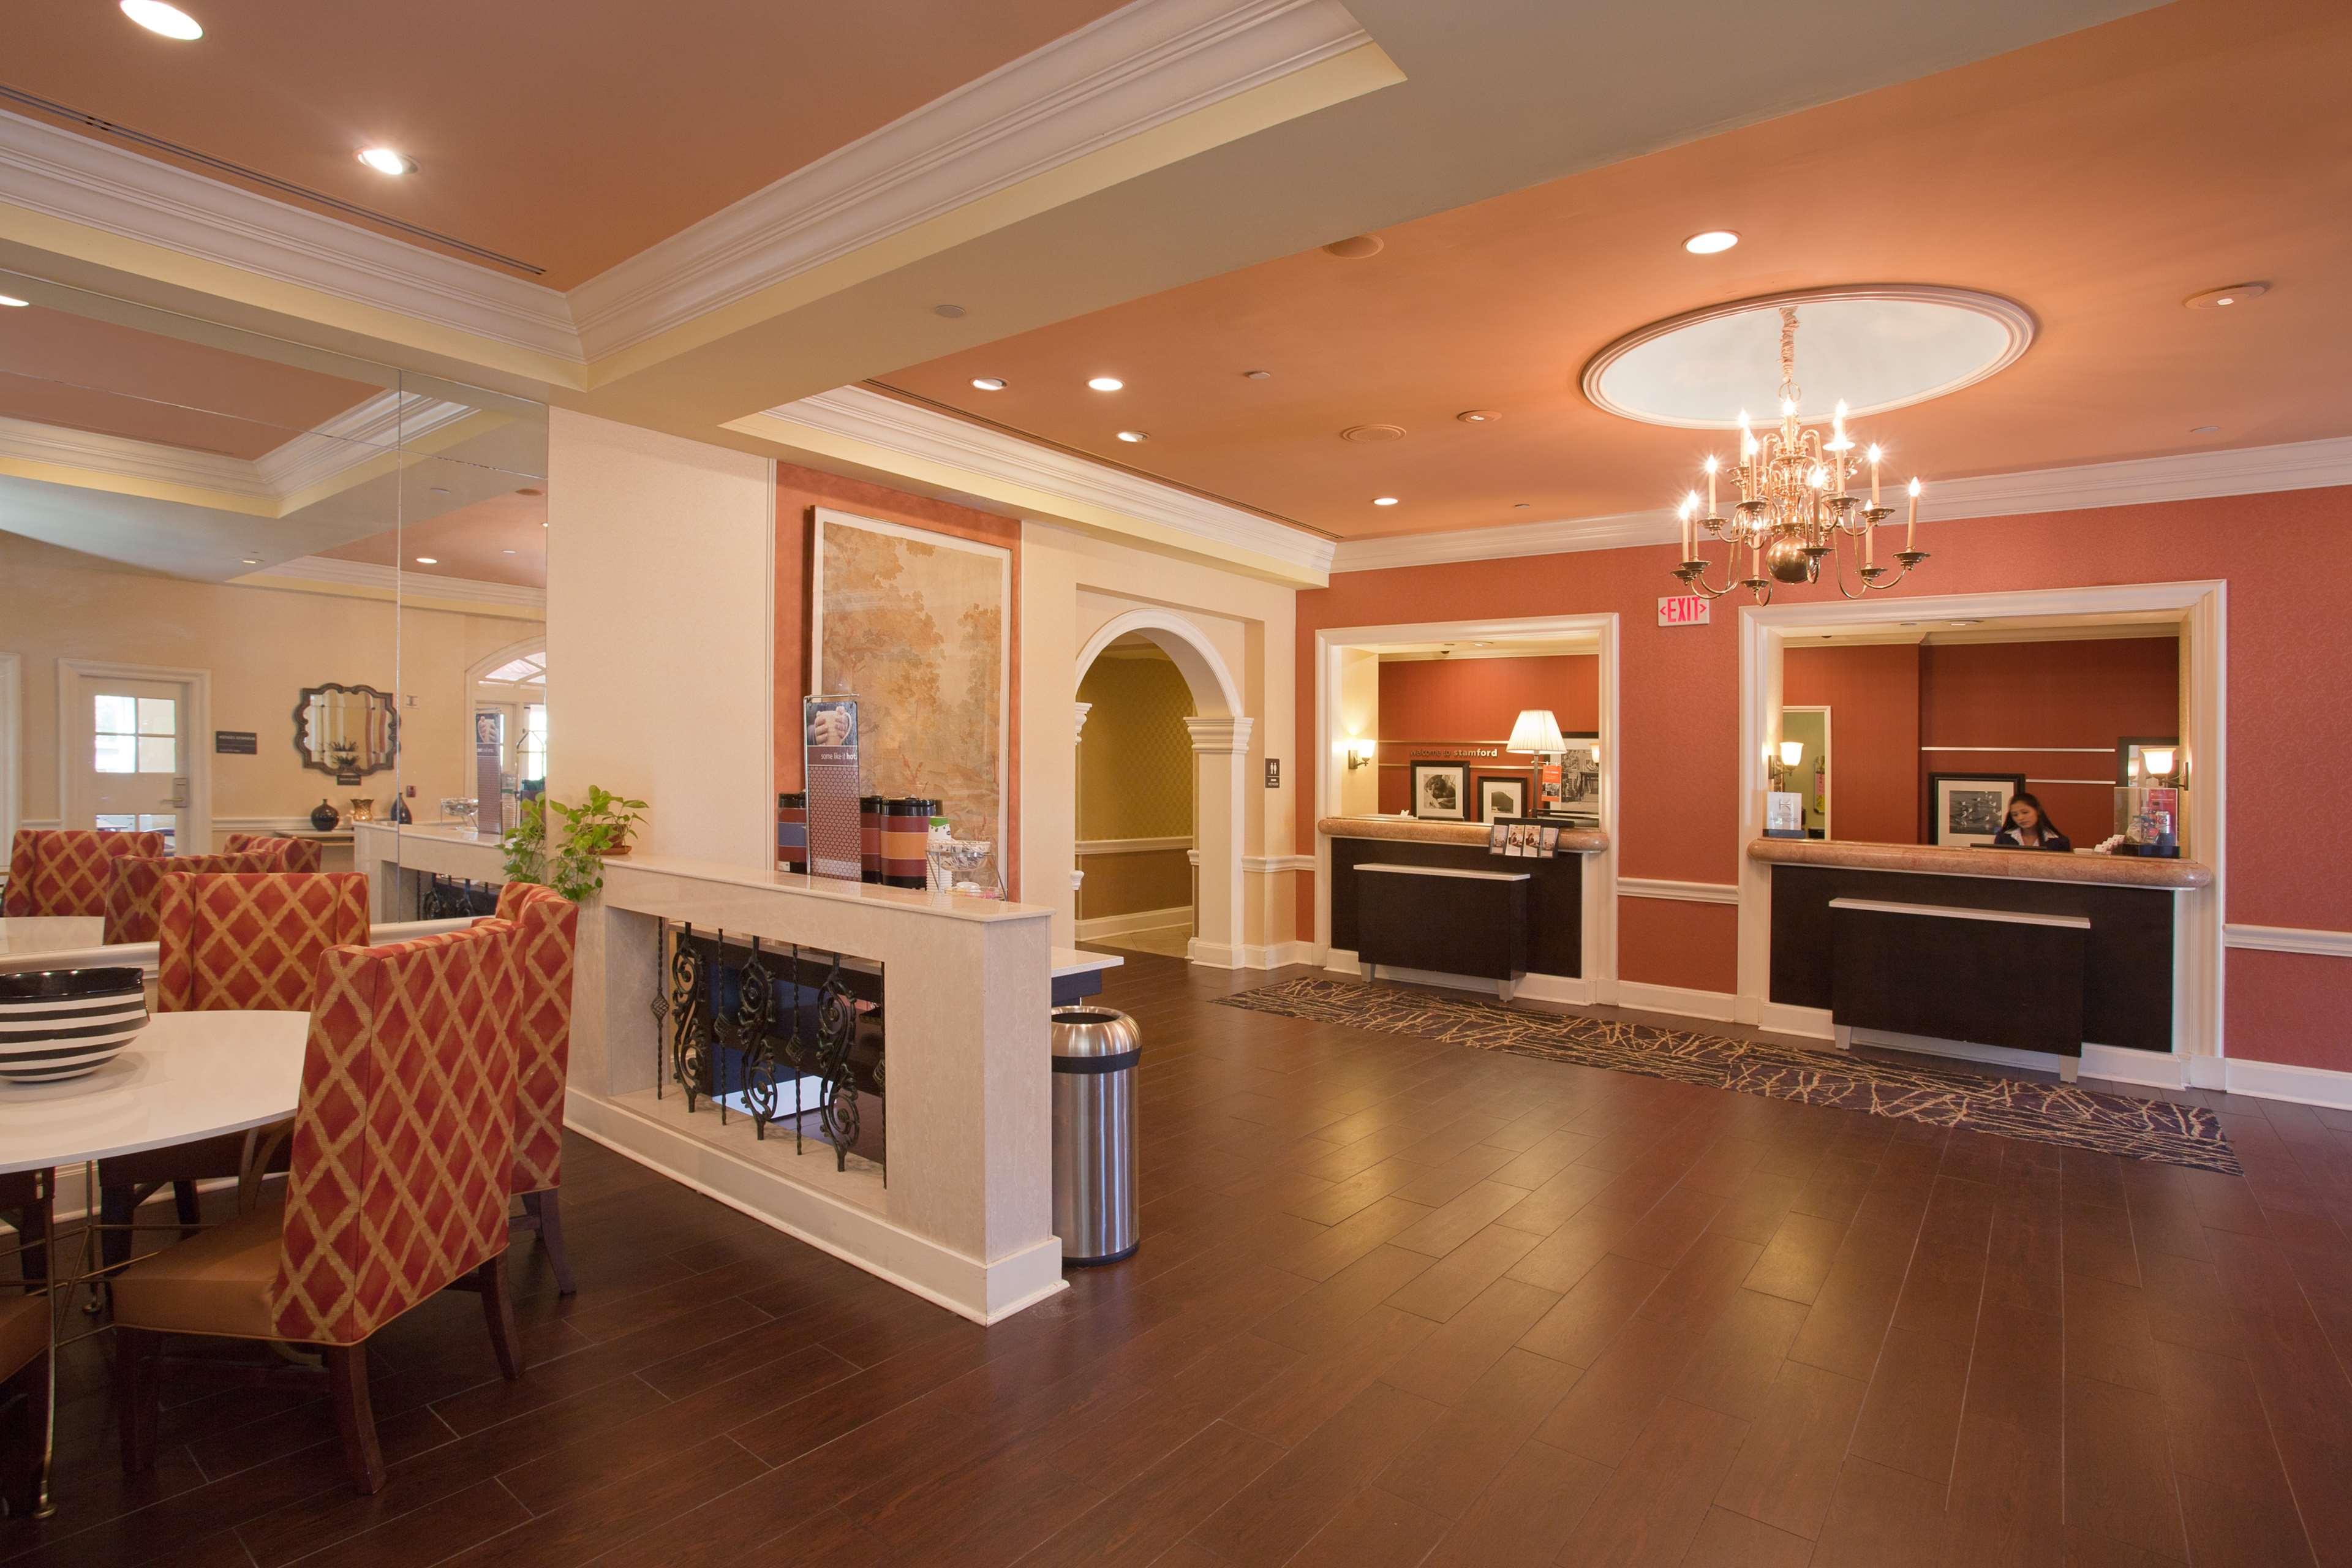 Hampton Inn & Suites Stamford image 6